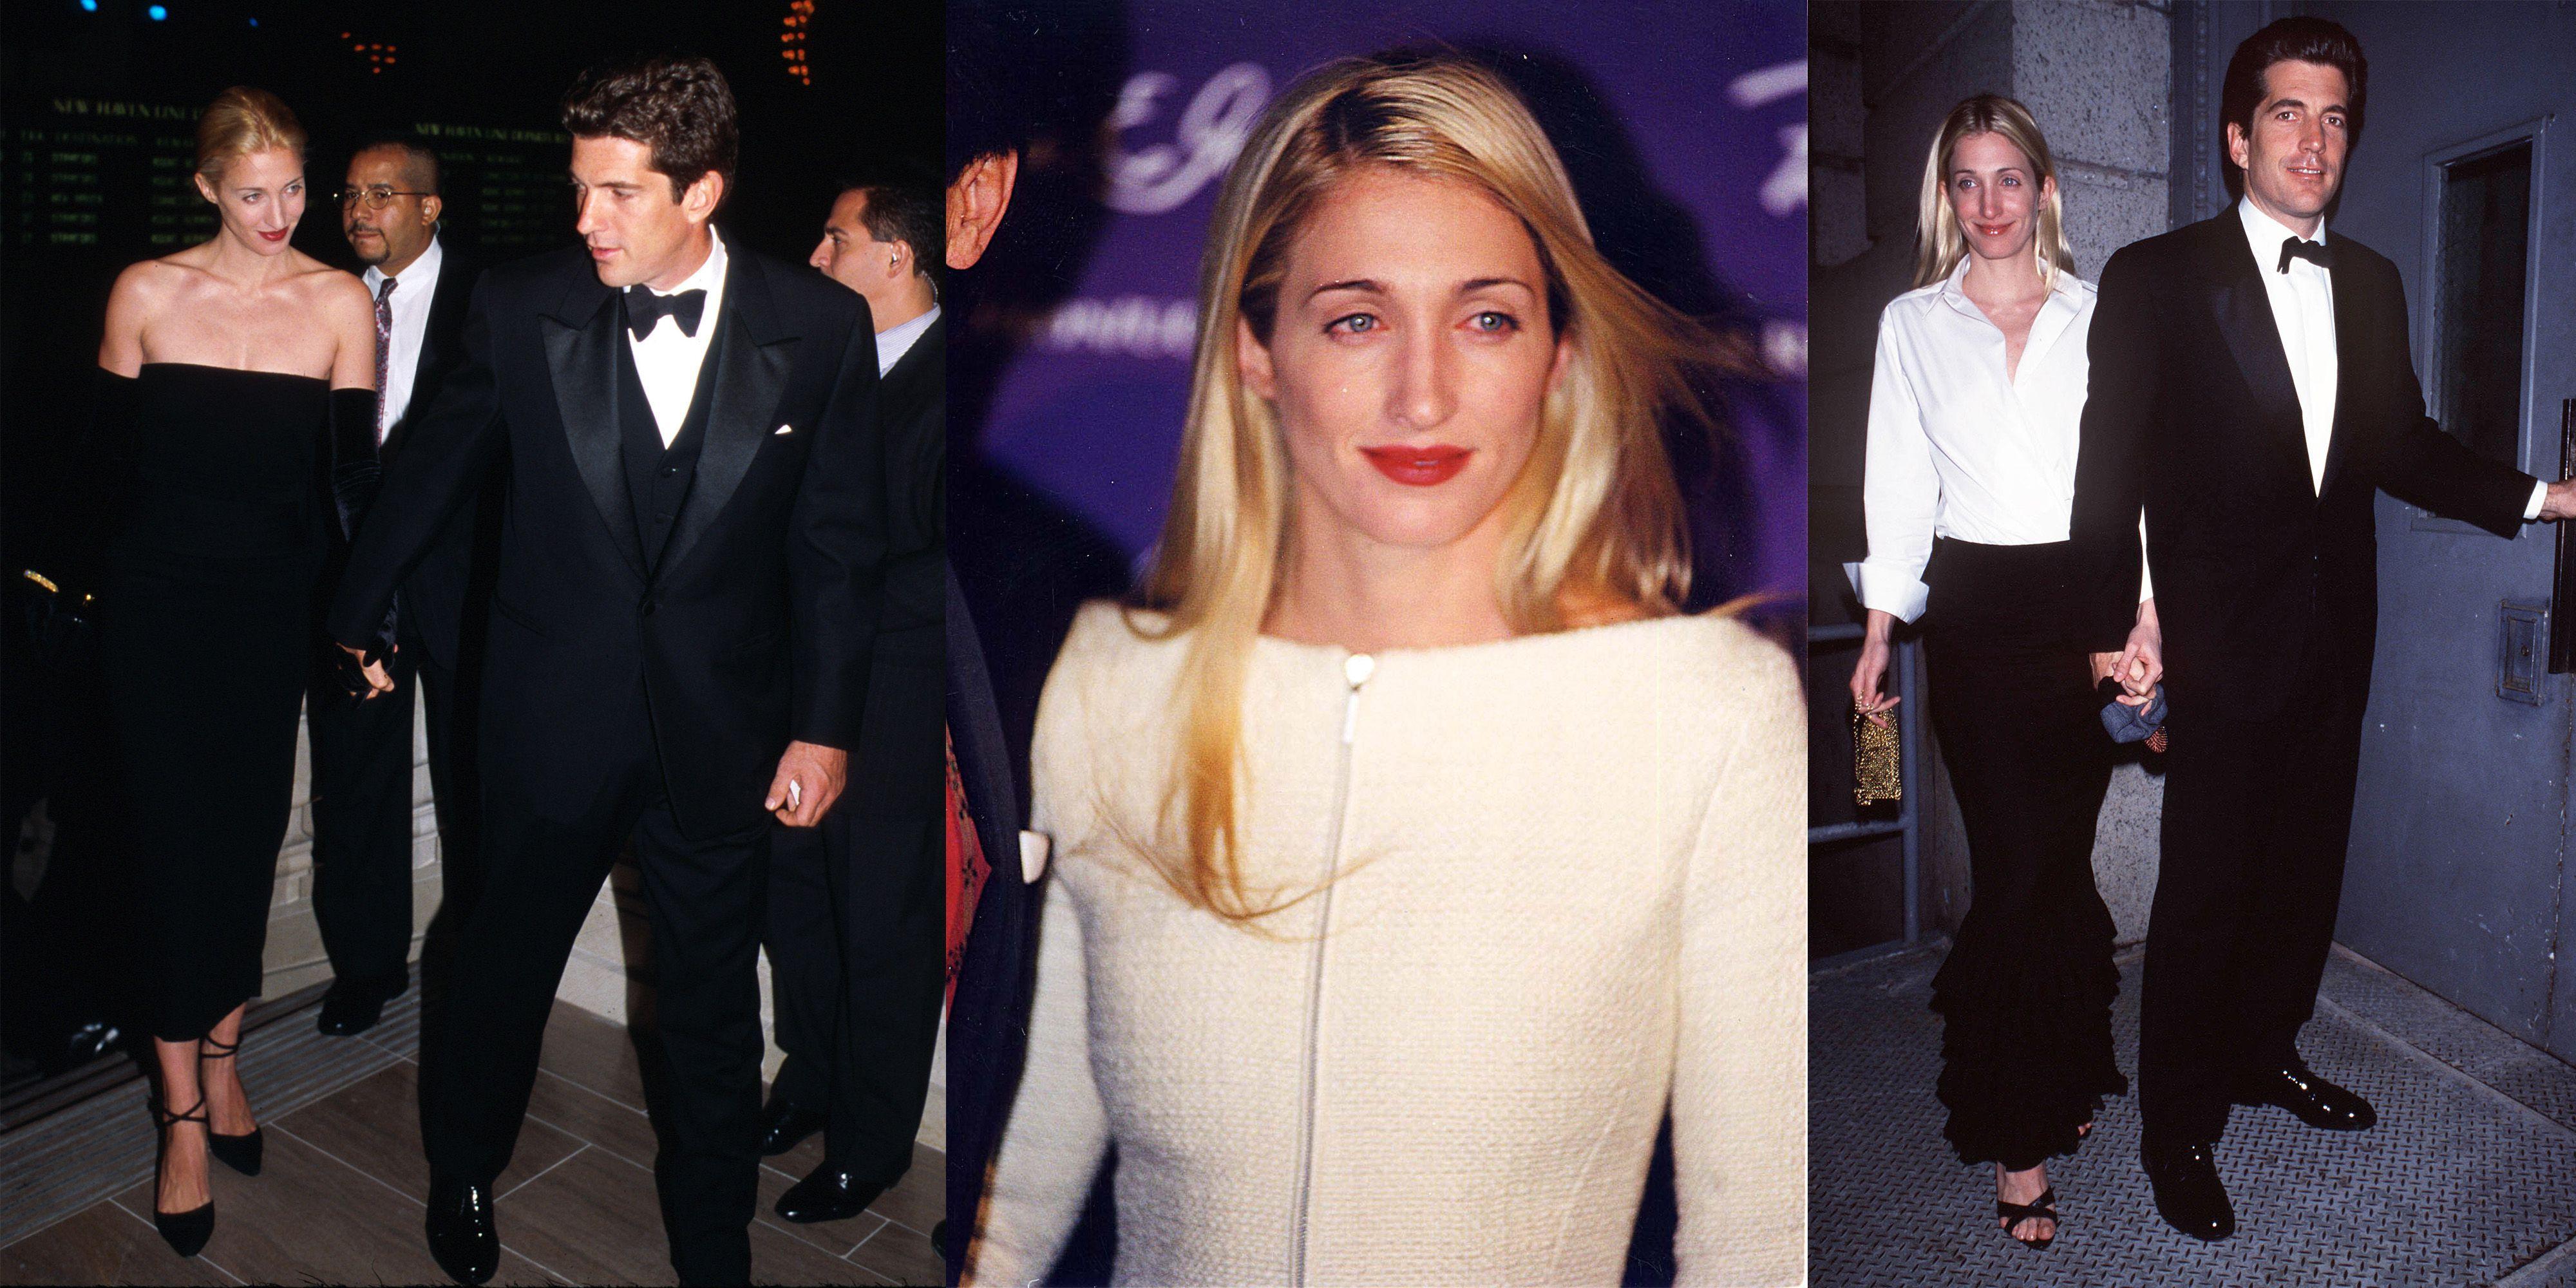 Carolyn kennedy bessette wedding dress  Why is Everyone Still So Obsessed With Carolyn BessetteKennedy